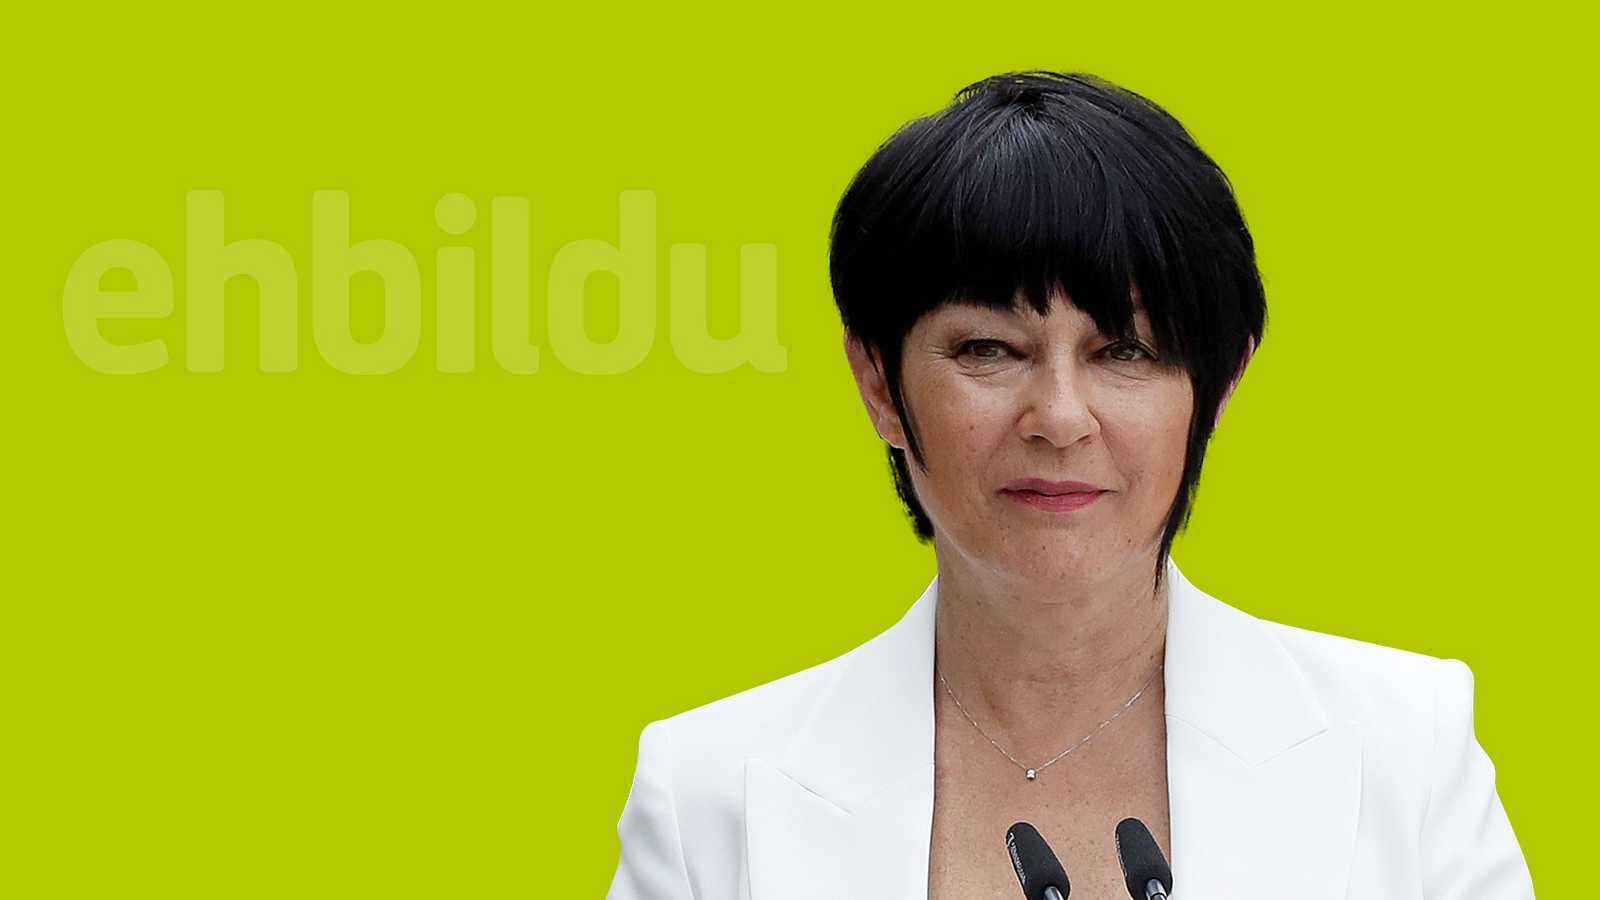 Elecciones en País Vasco 2020: Madalen Iriarte, candidata a lehendakari